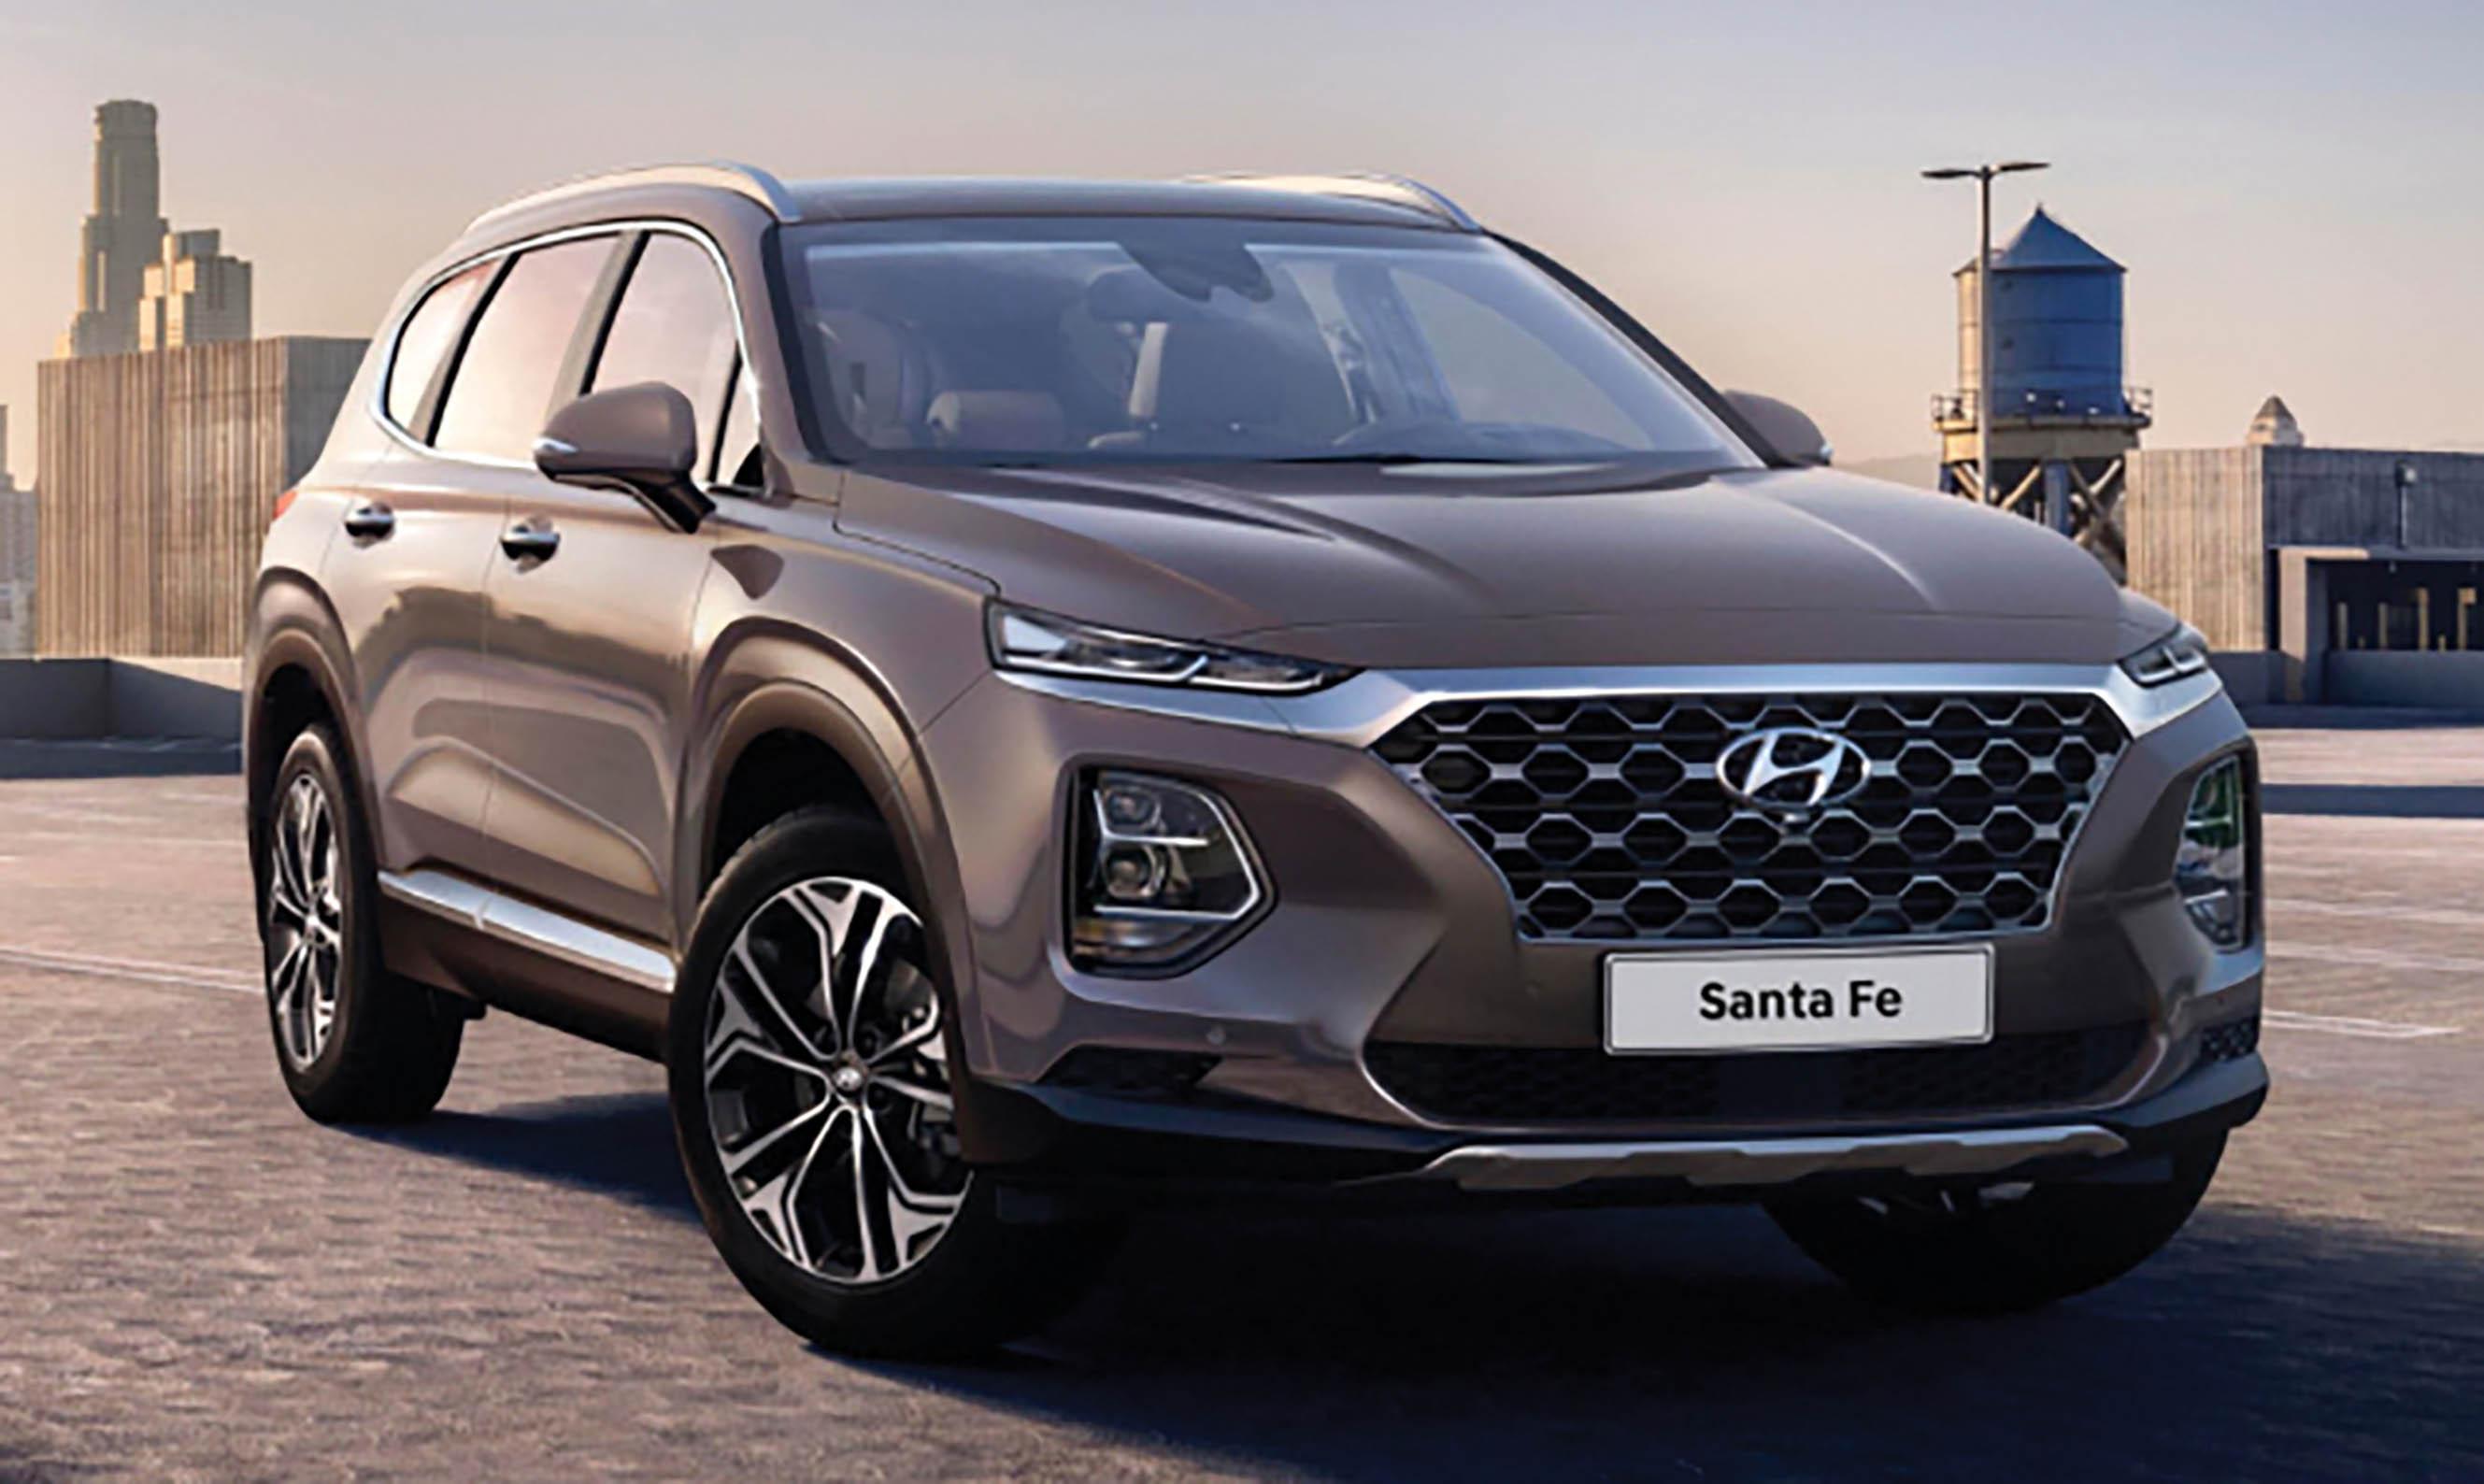 New Hyundai Santa Fe goes on sale here